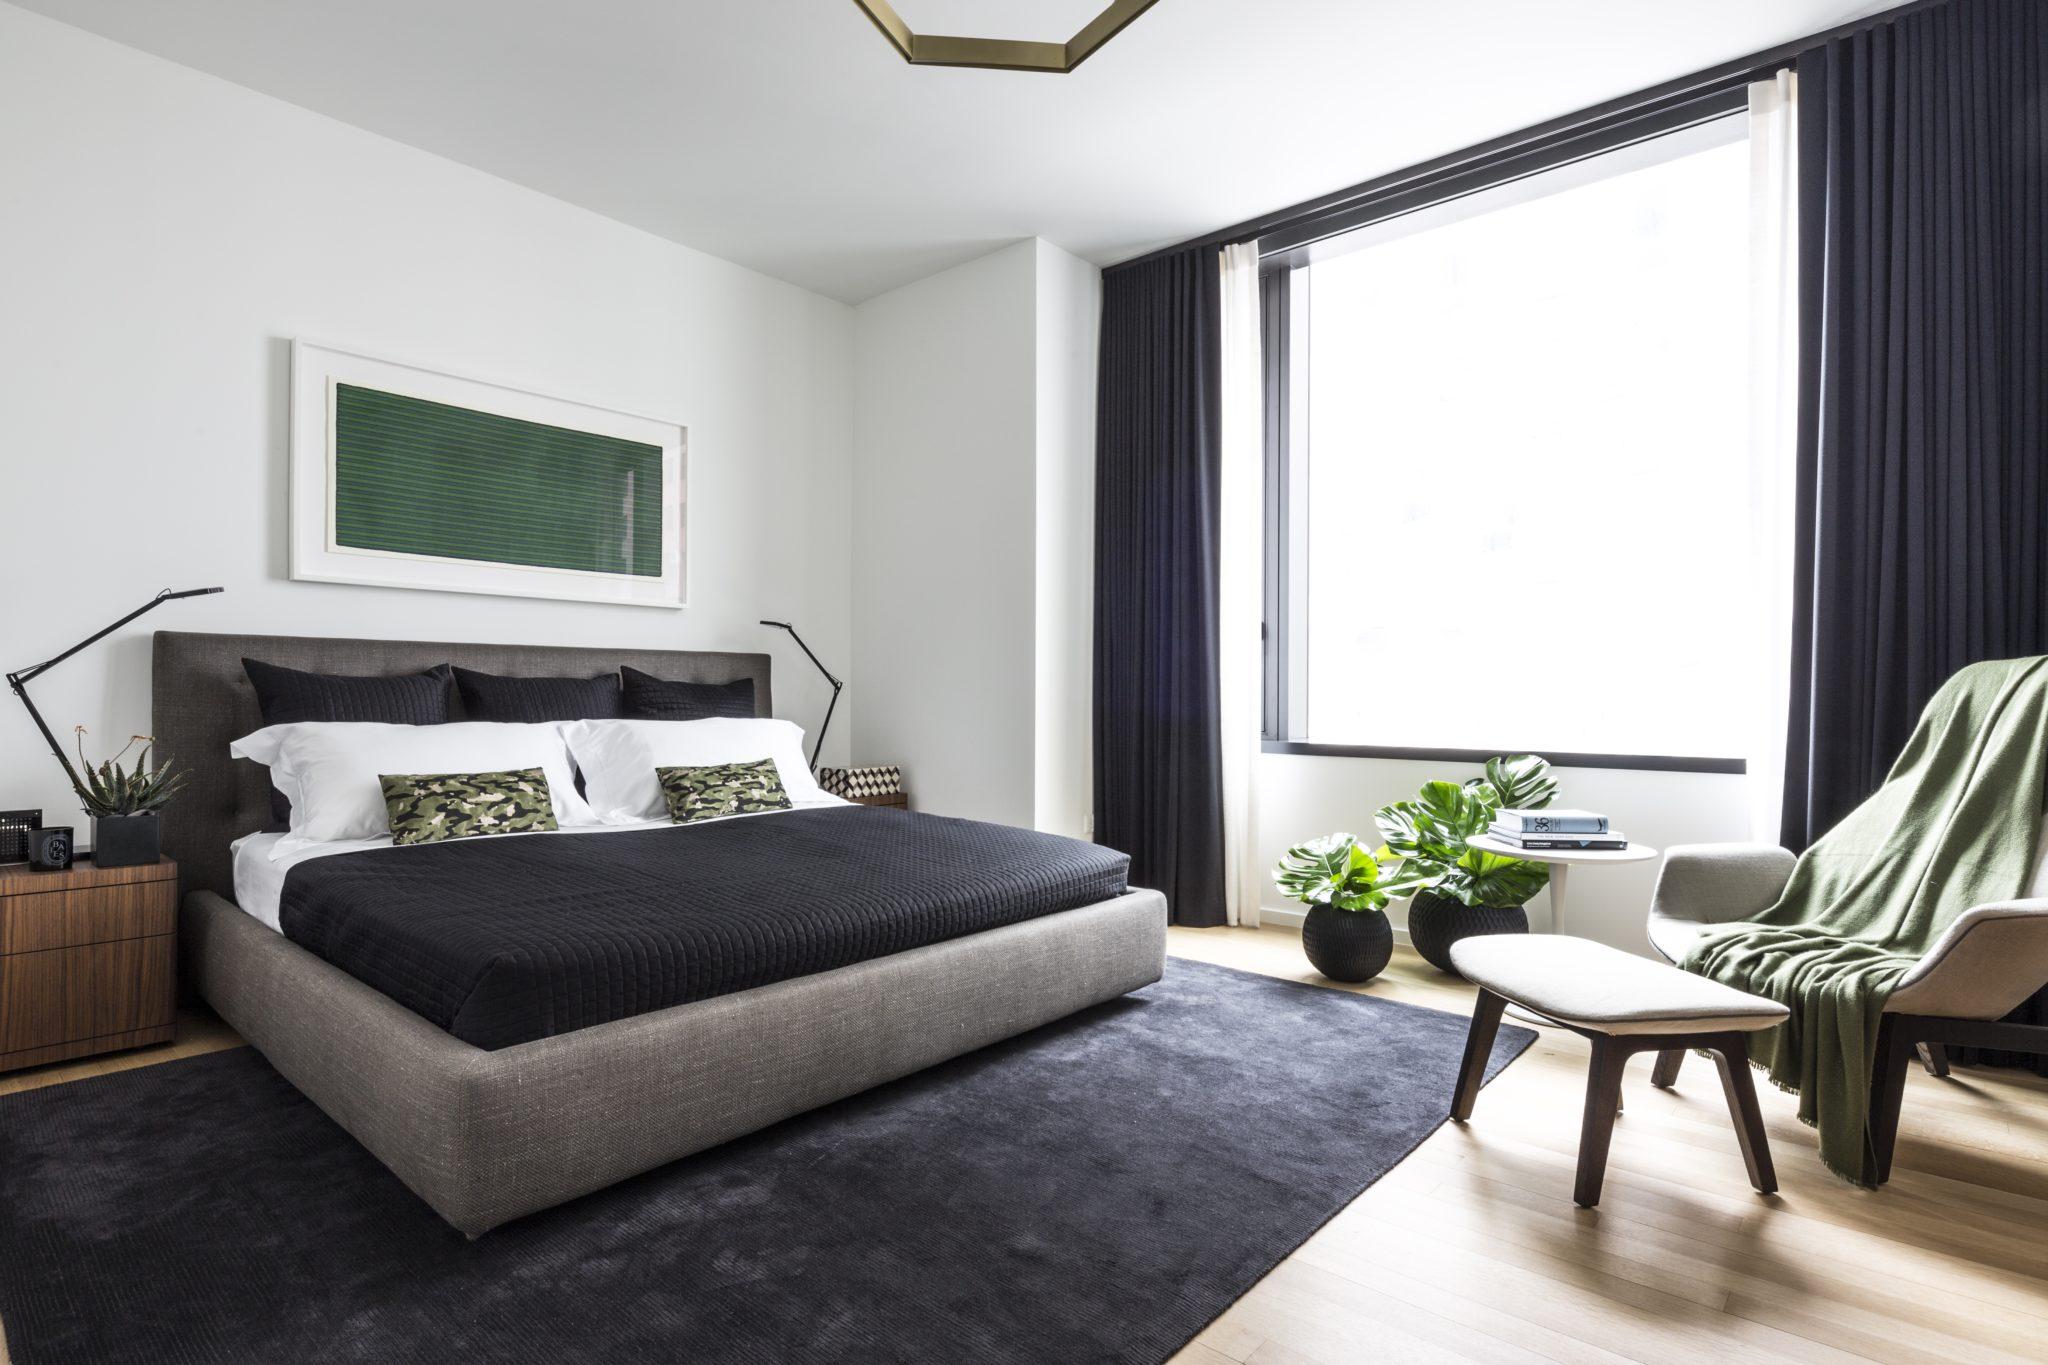 Bedroom in 50 United Nations Plaza model apartment by Bennett Leifer Interiors